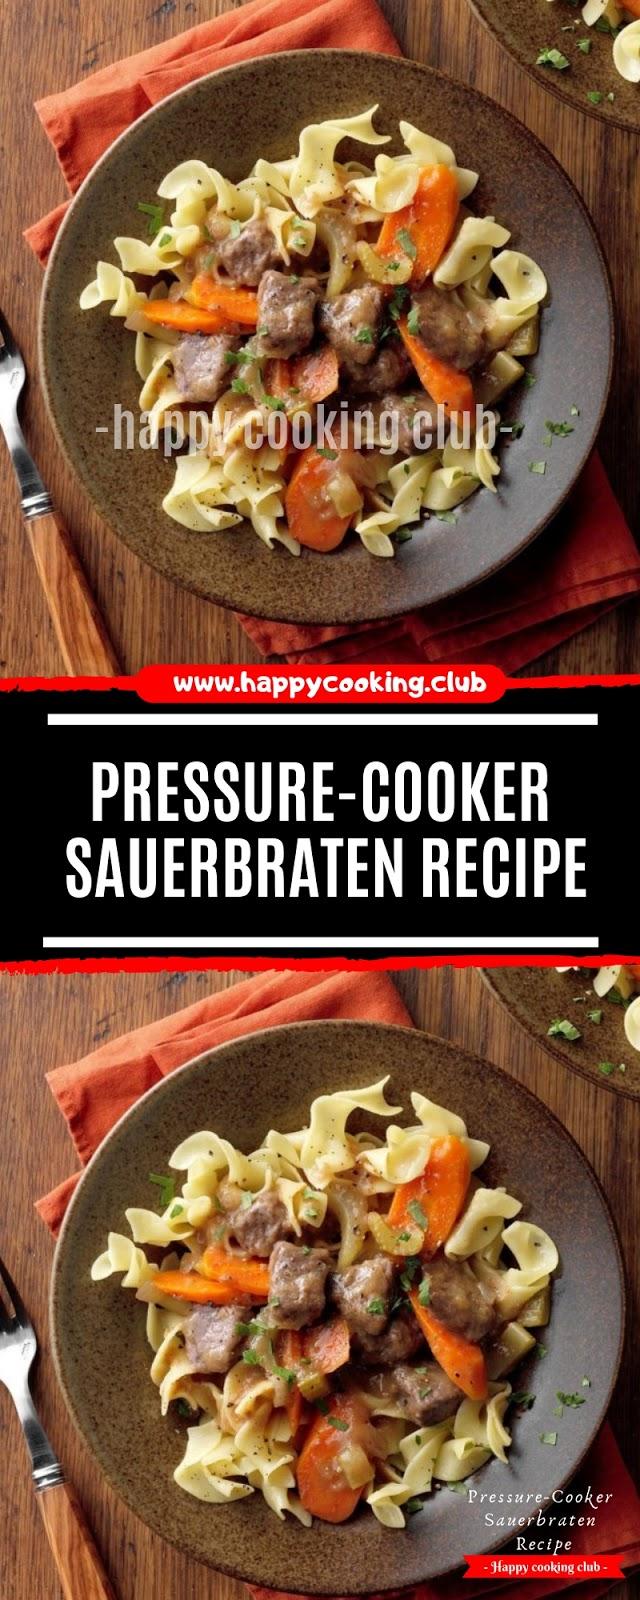 Pressure-Cooker Sauerbraten Recipe